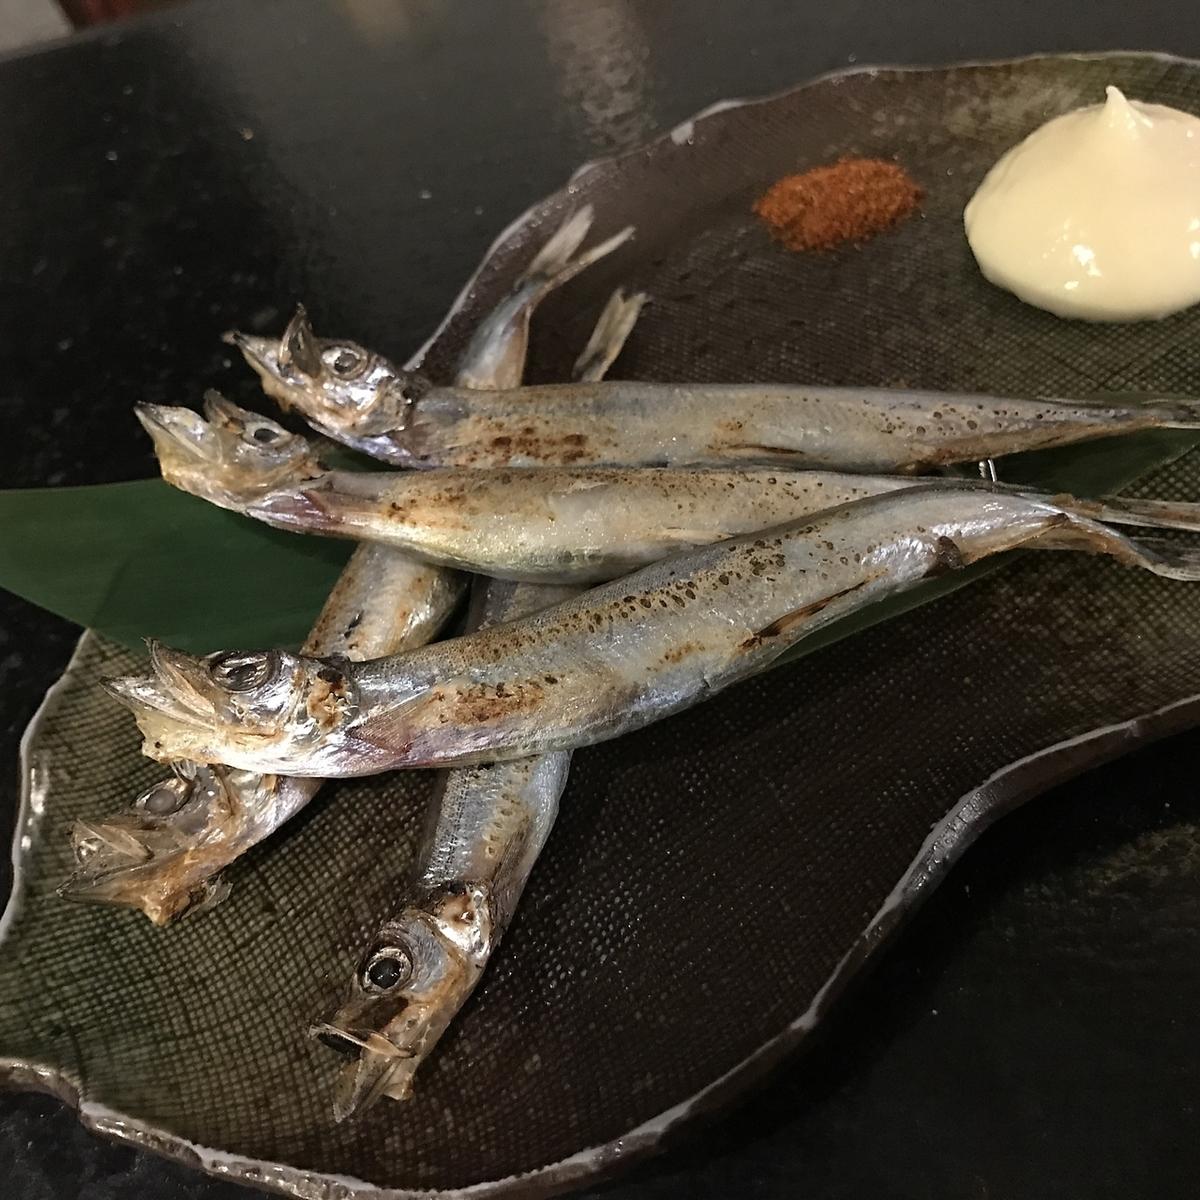 Children shrimps (5 animals)